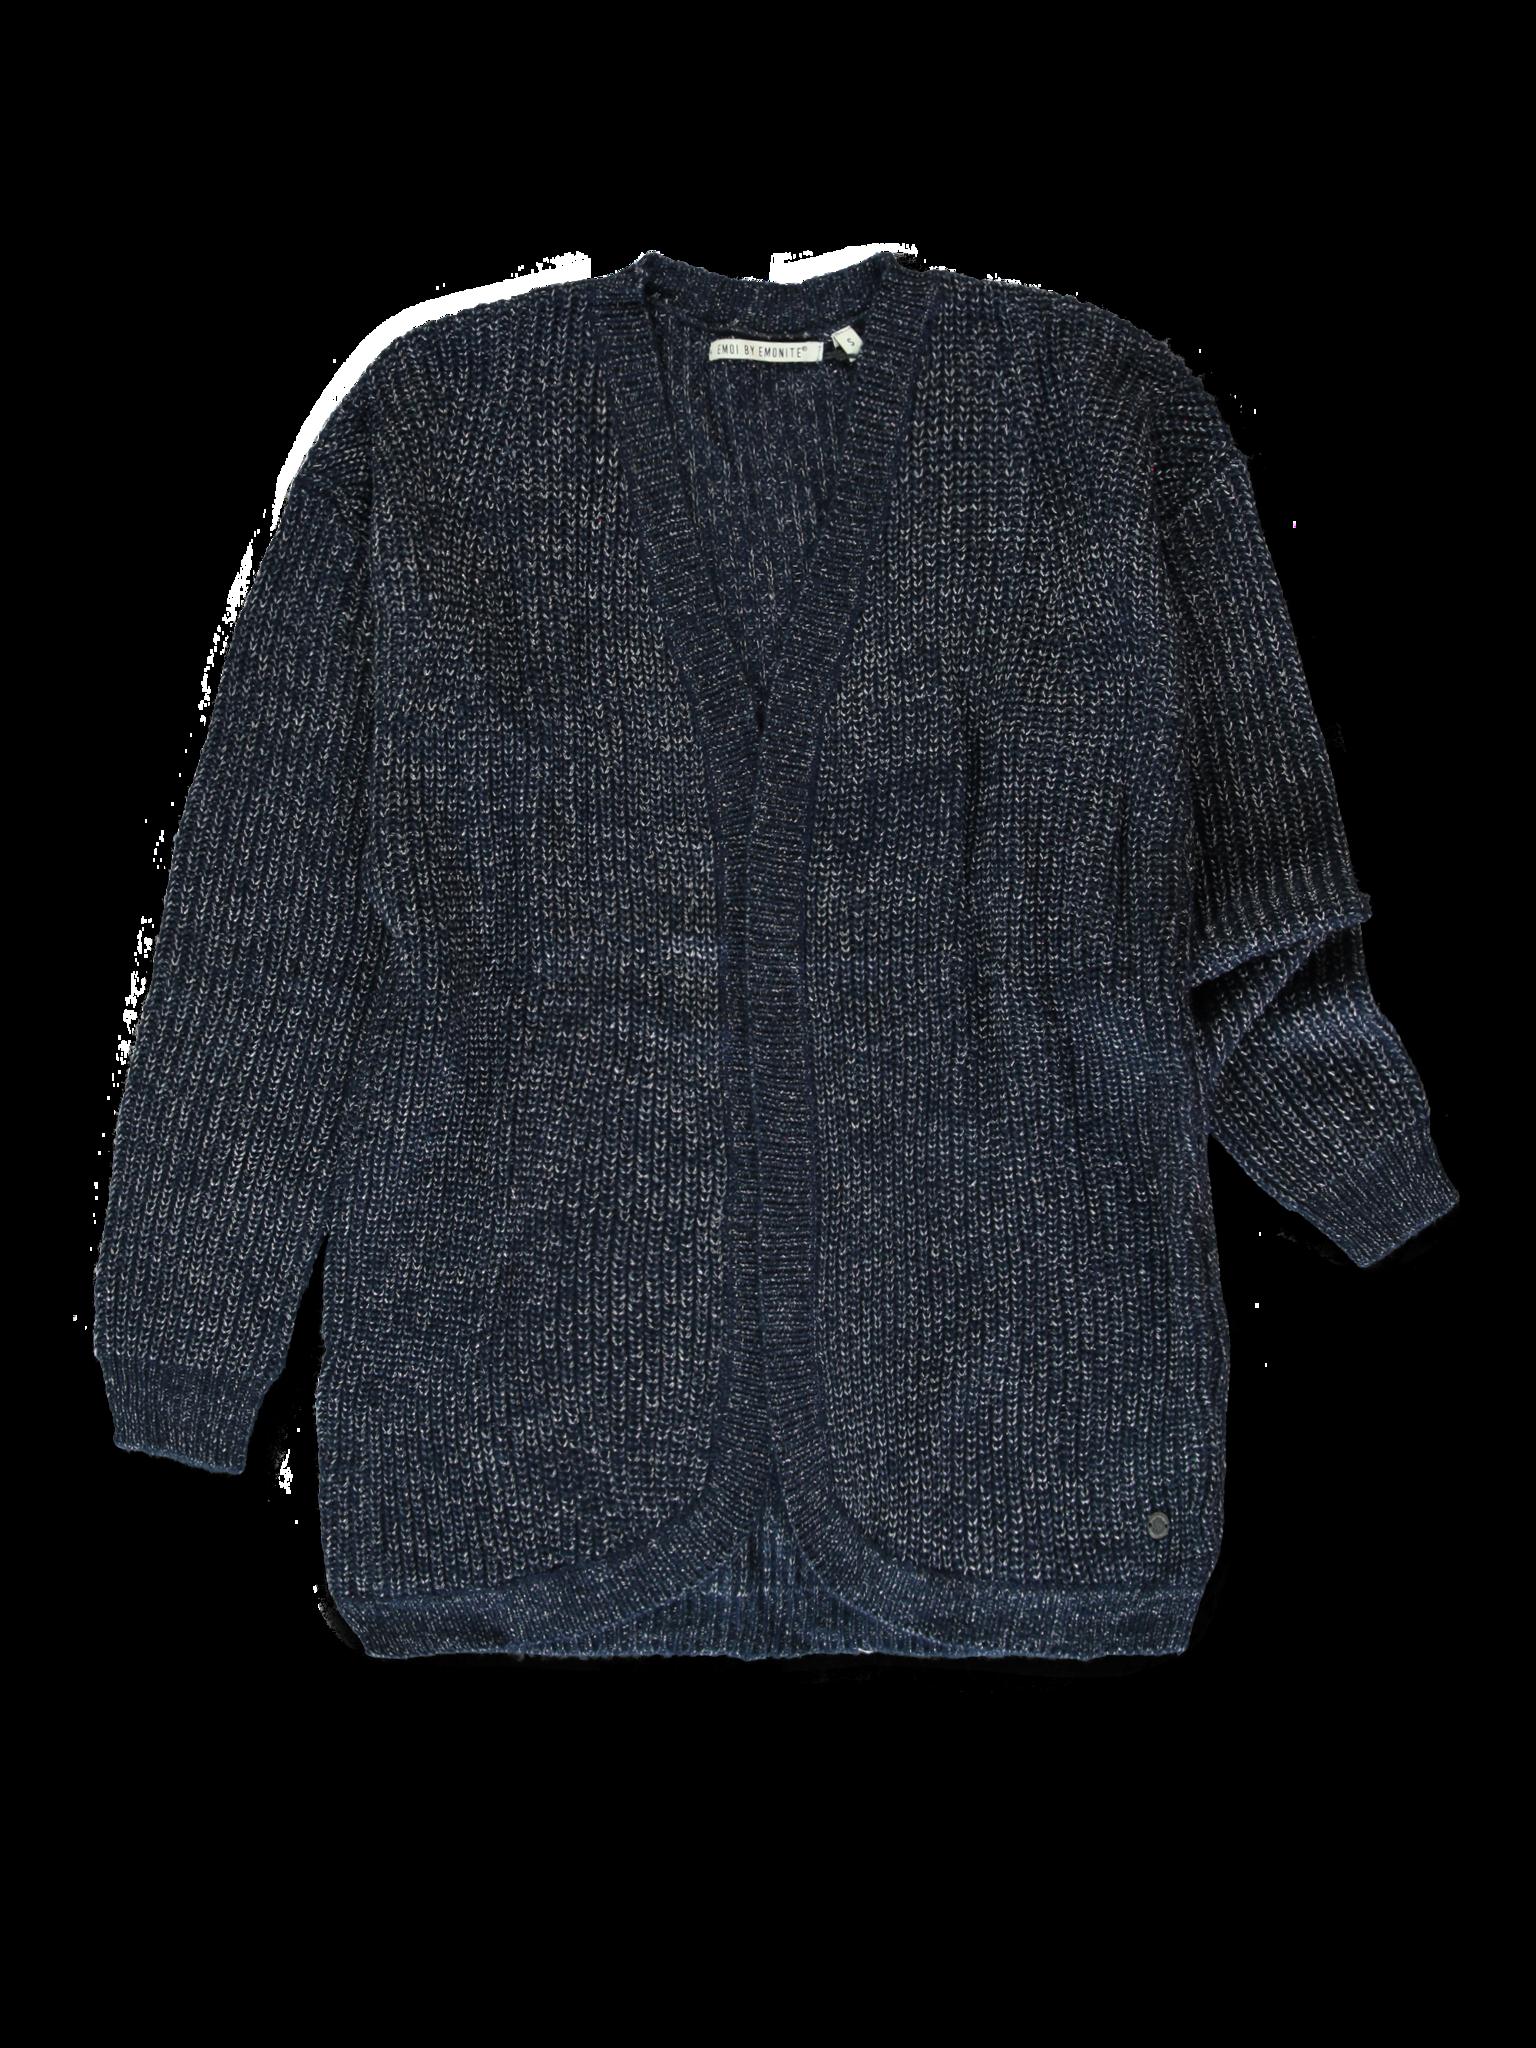 Emoi | Winter 2019 Ladies | Cardigan Knitwear | 18 pcs/box